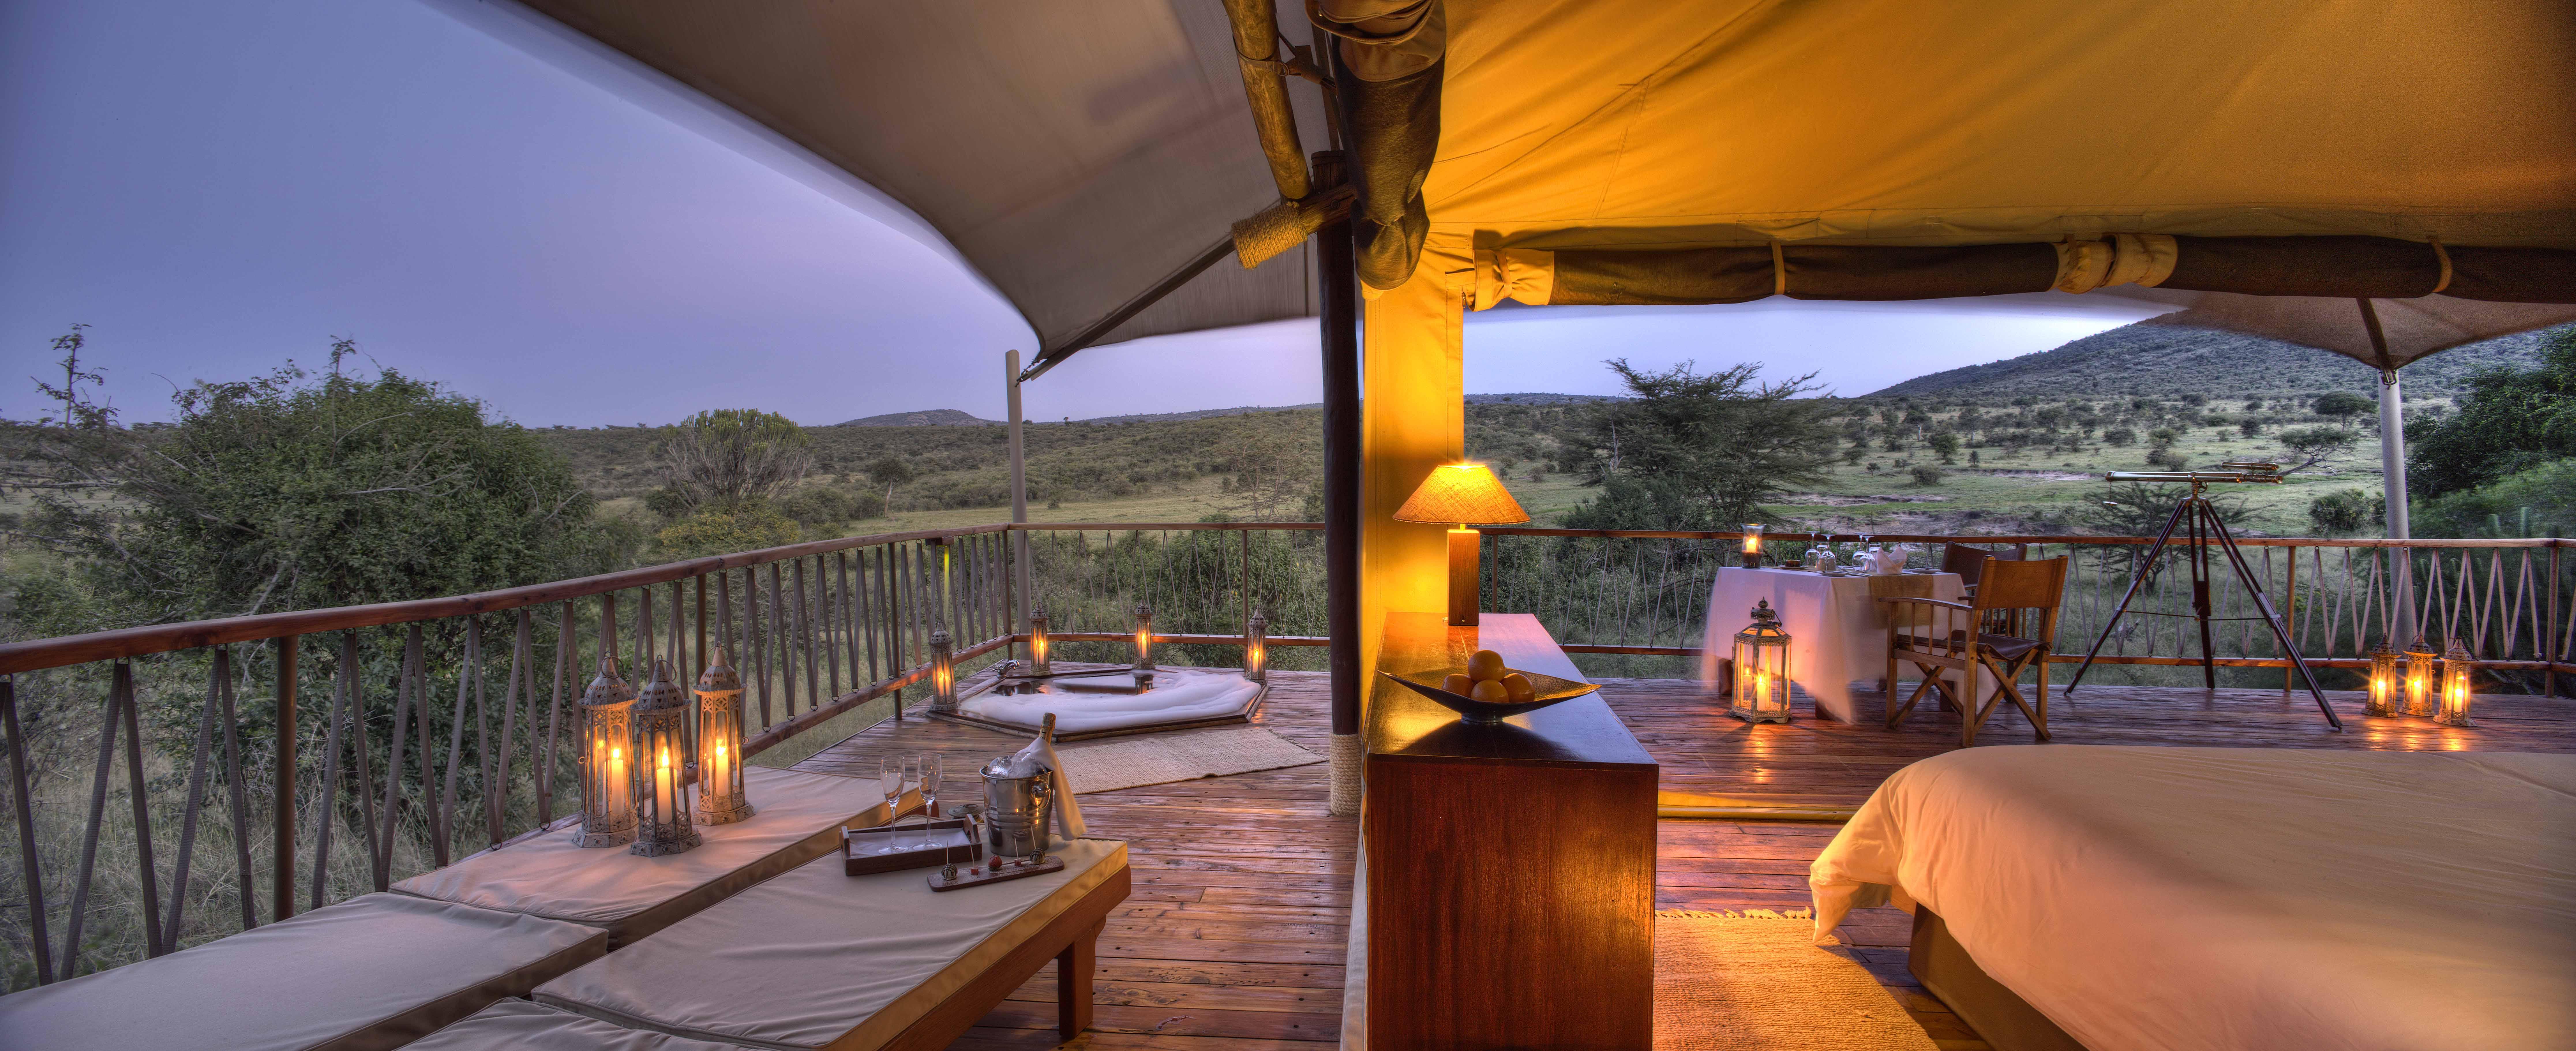 Mara Bushtops Safari Africa